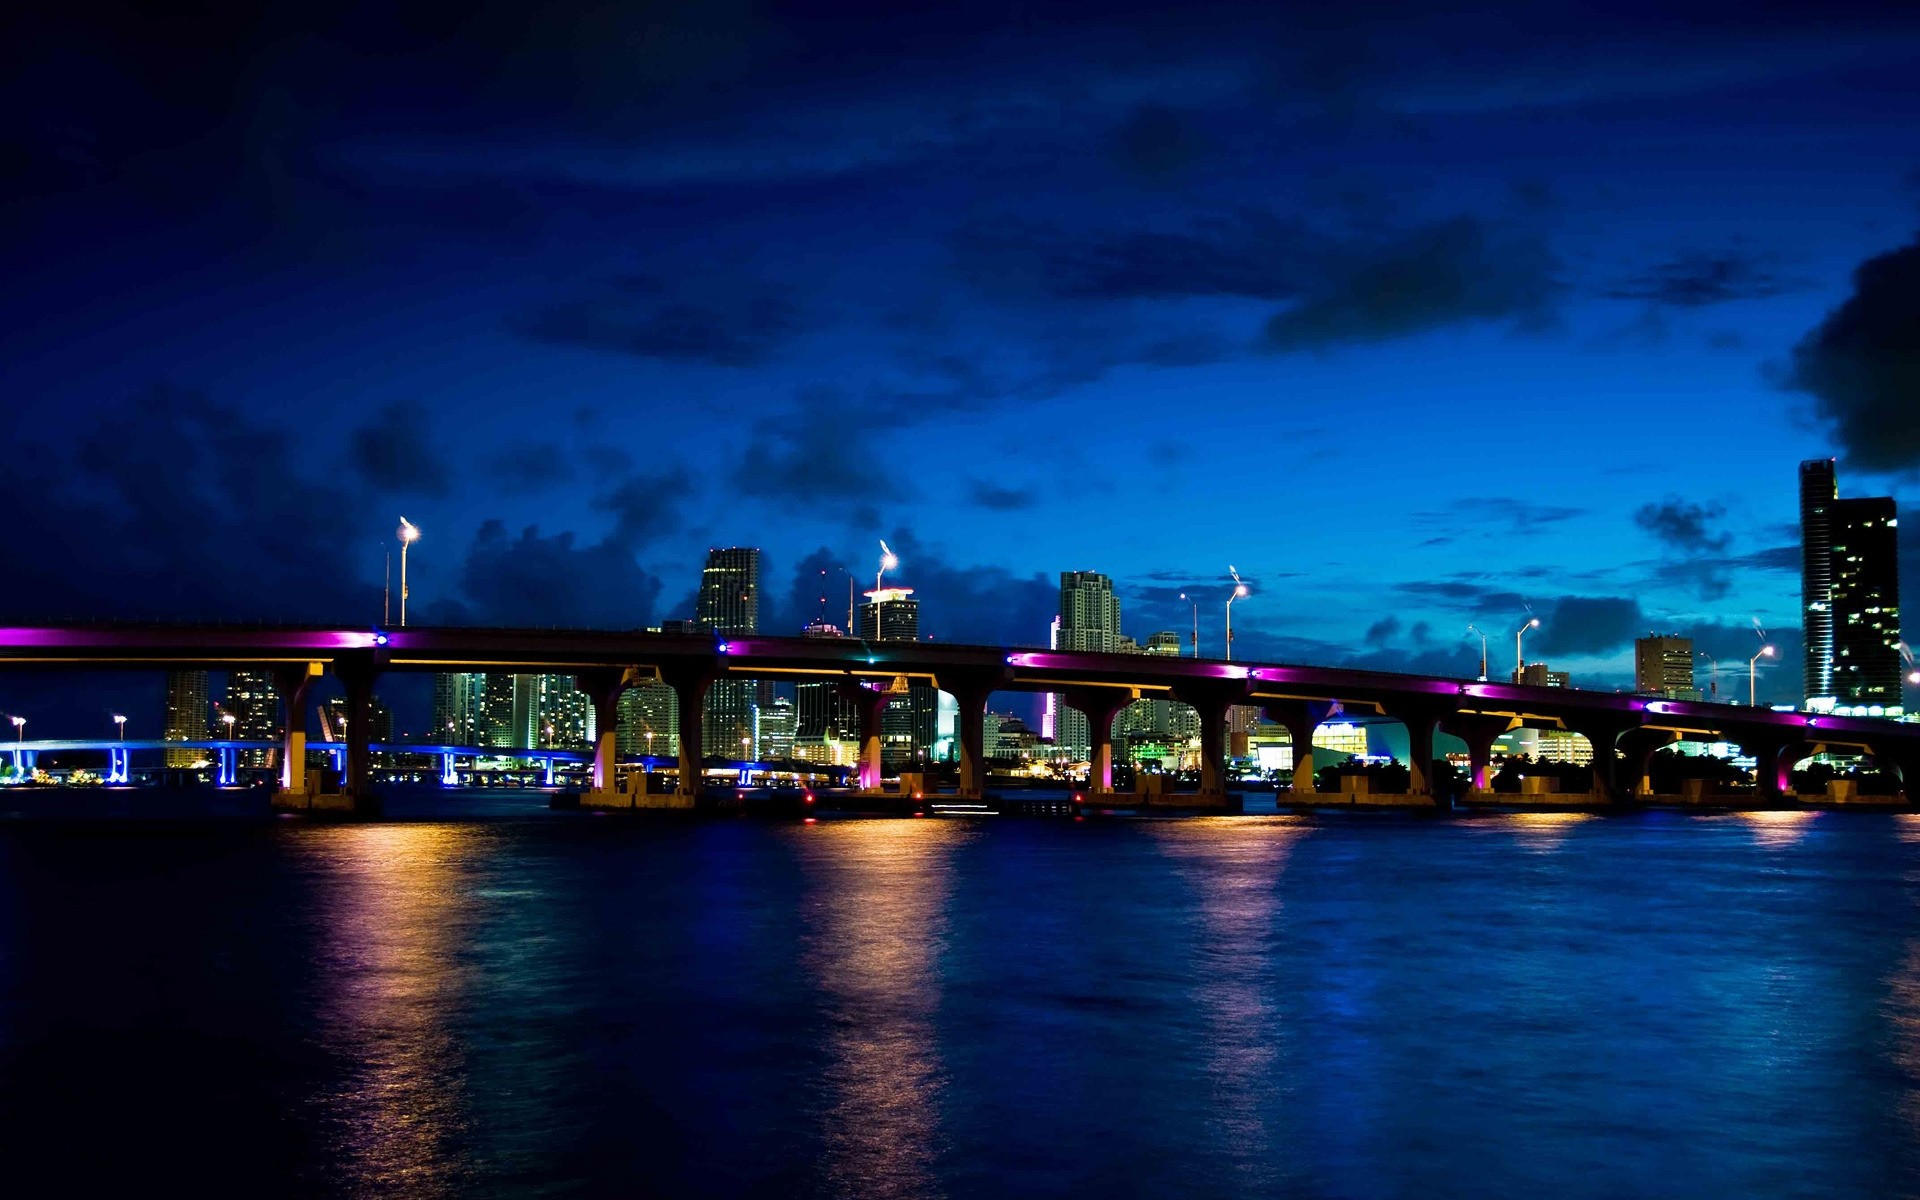 Мост огни ночь  № 3716561 бесплатно